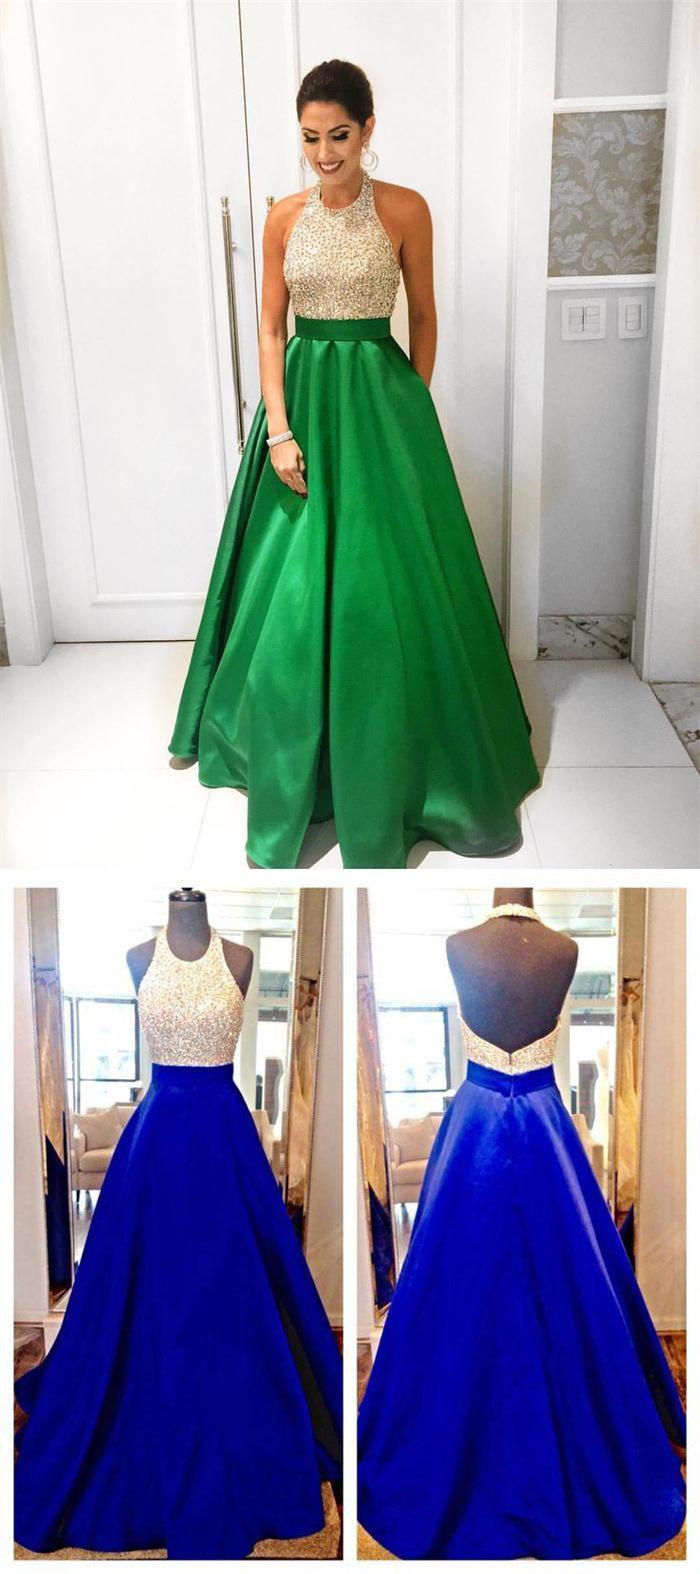 Green backless prom dress  Green Aline Satin Beaded Prom DressesHalter Backless Prom Gowns